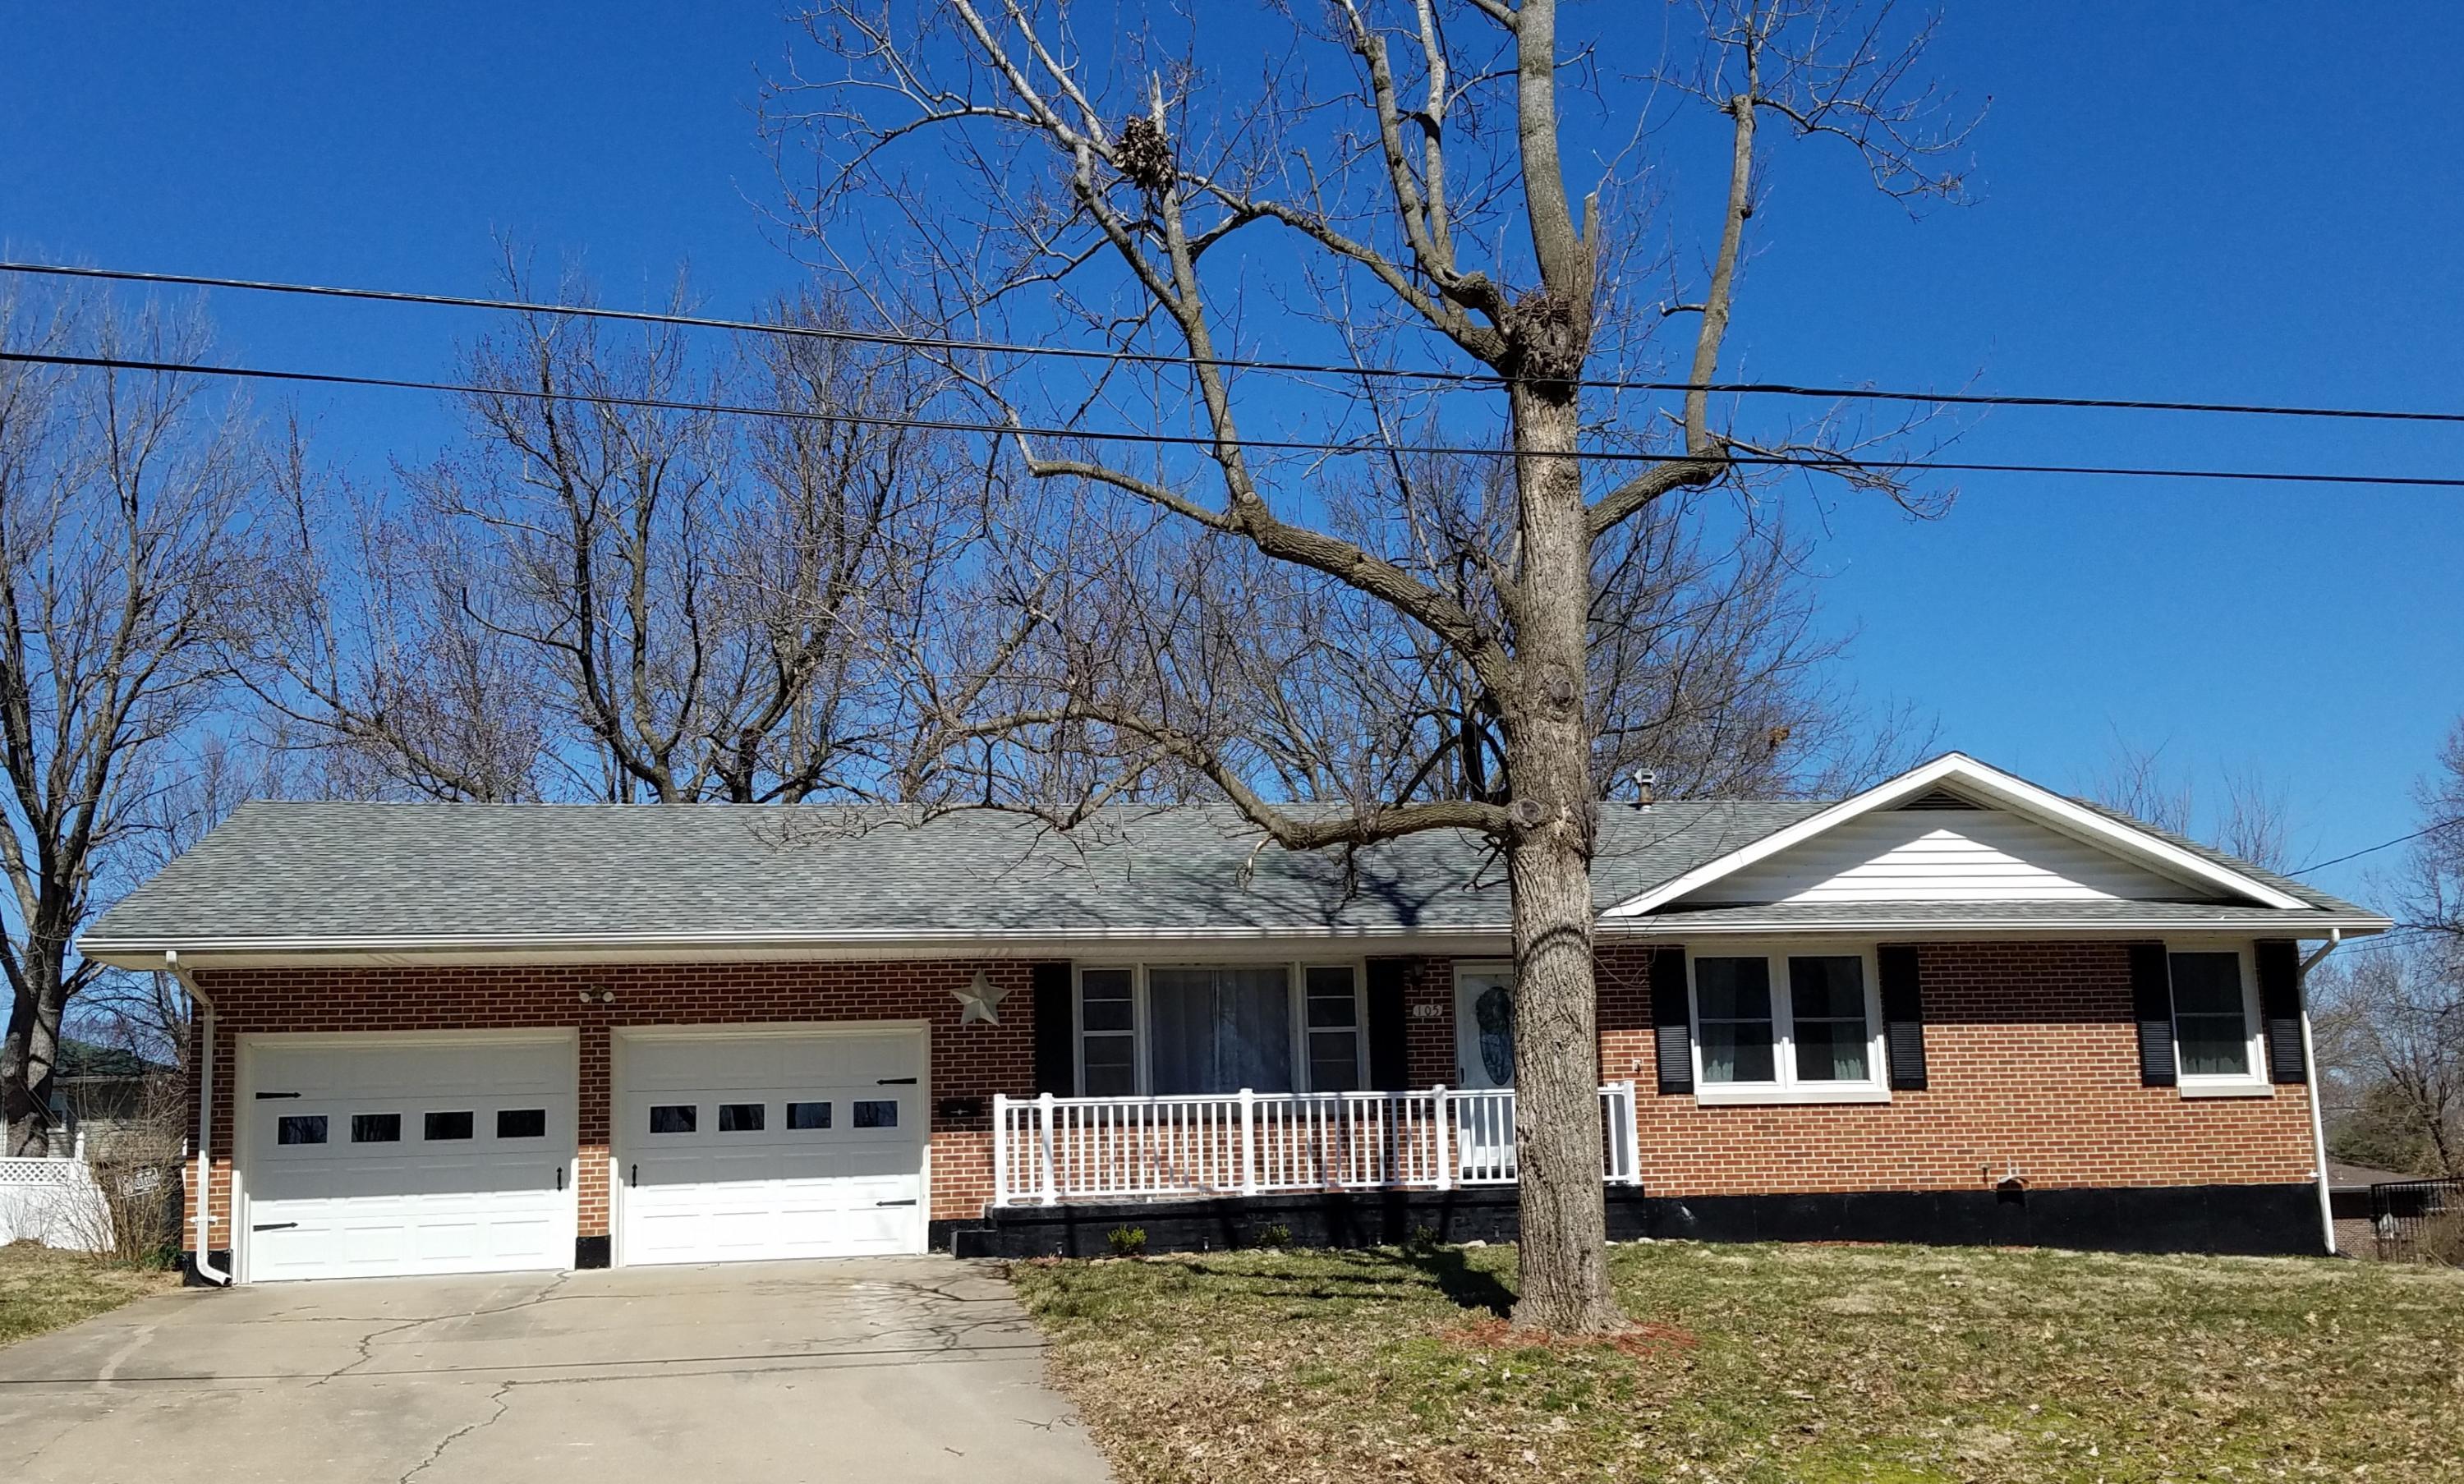 105 COLLIER LN, FULTON, Missouri